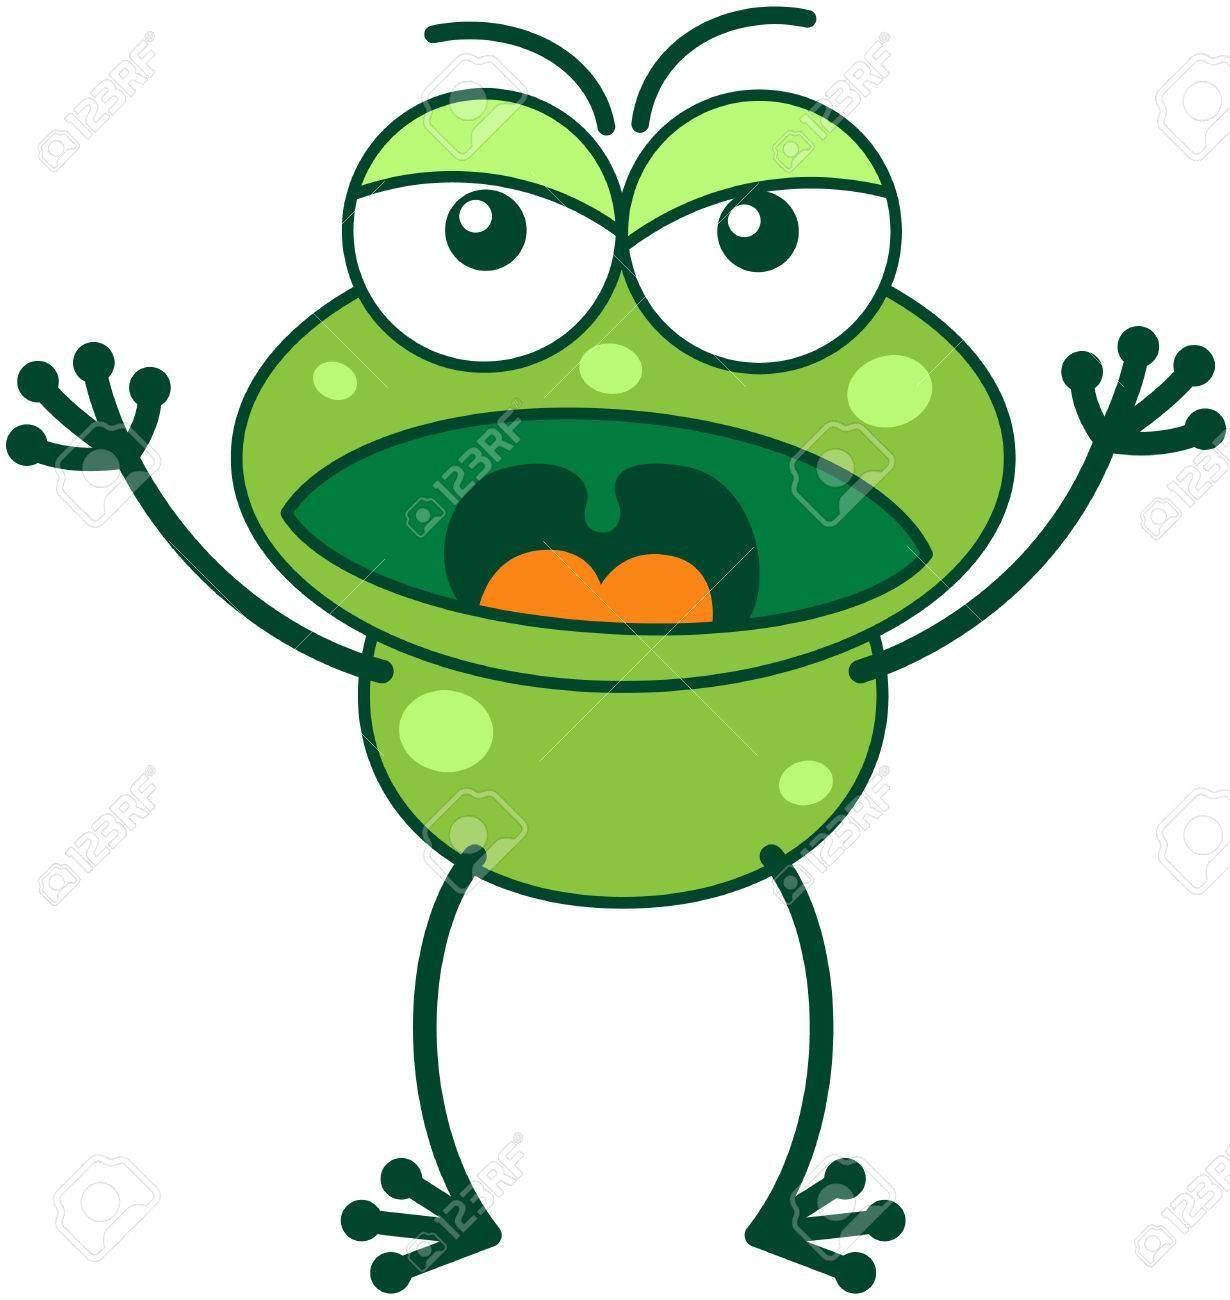 1230x1300 Secrets Frogs Legs Cartoon Focus Frog Pics Images Of Free Download